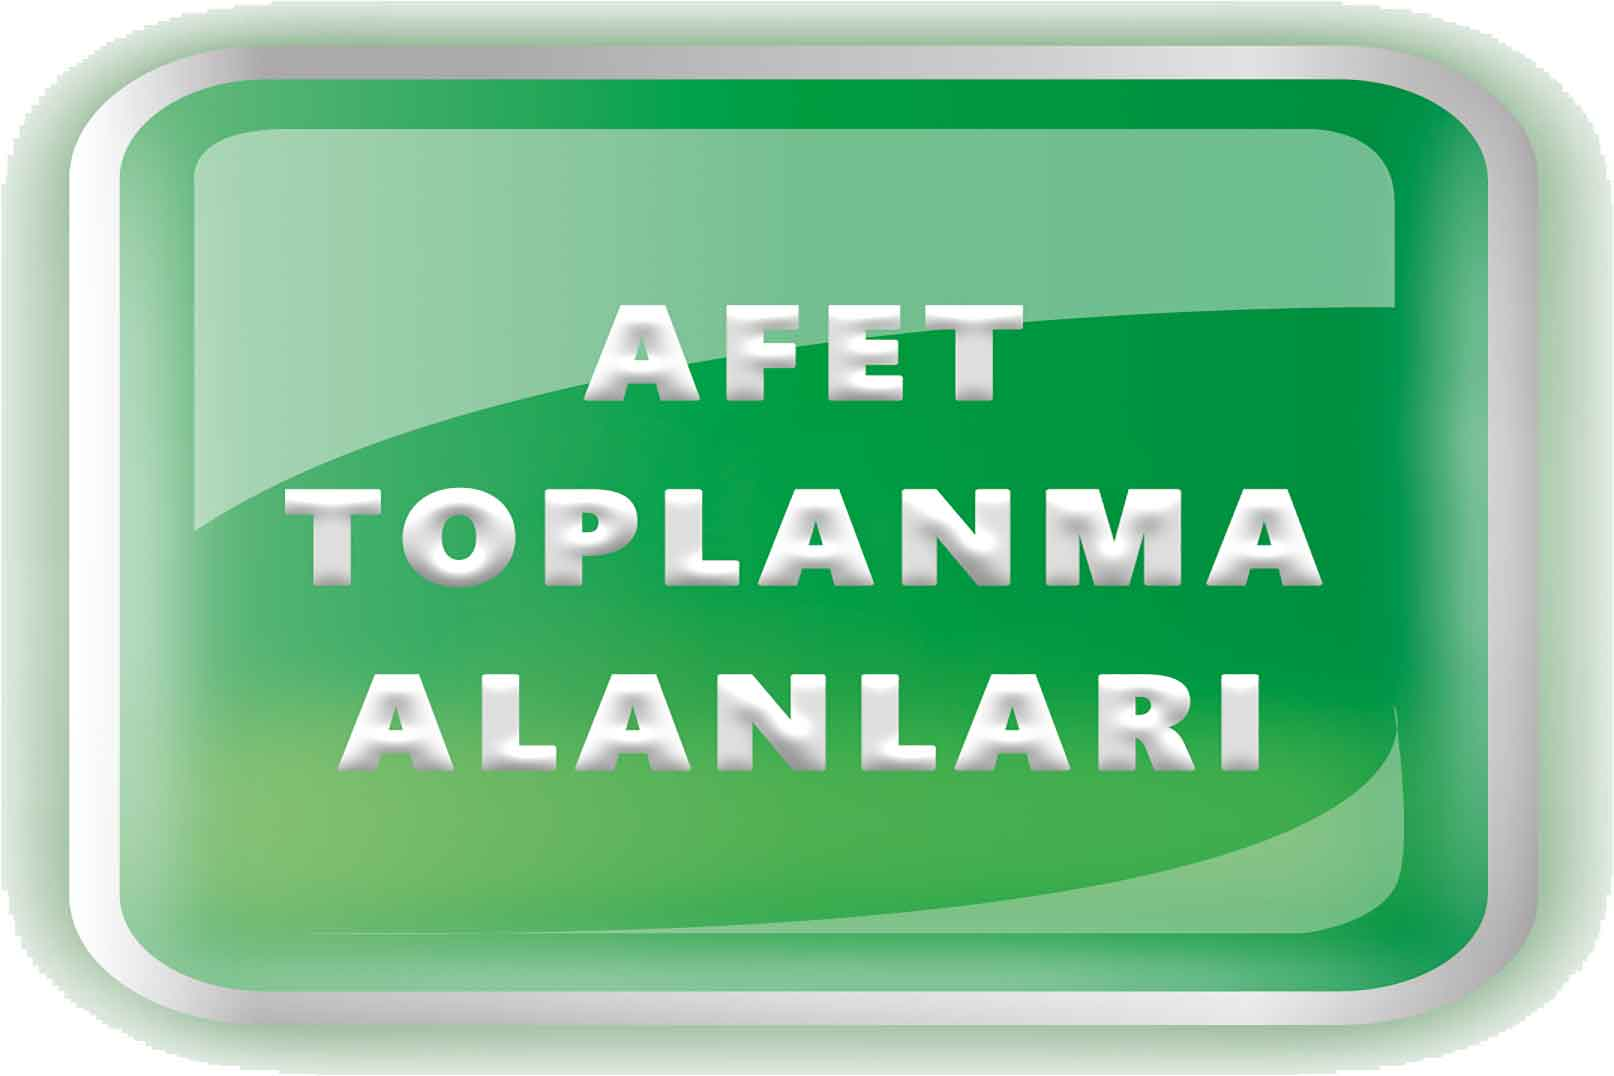 AFET TOPLANMA ALANLARI